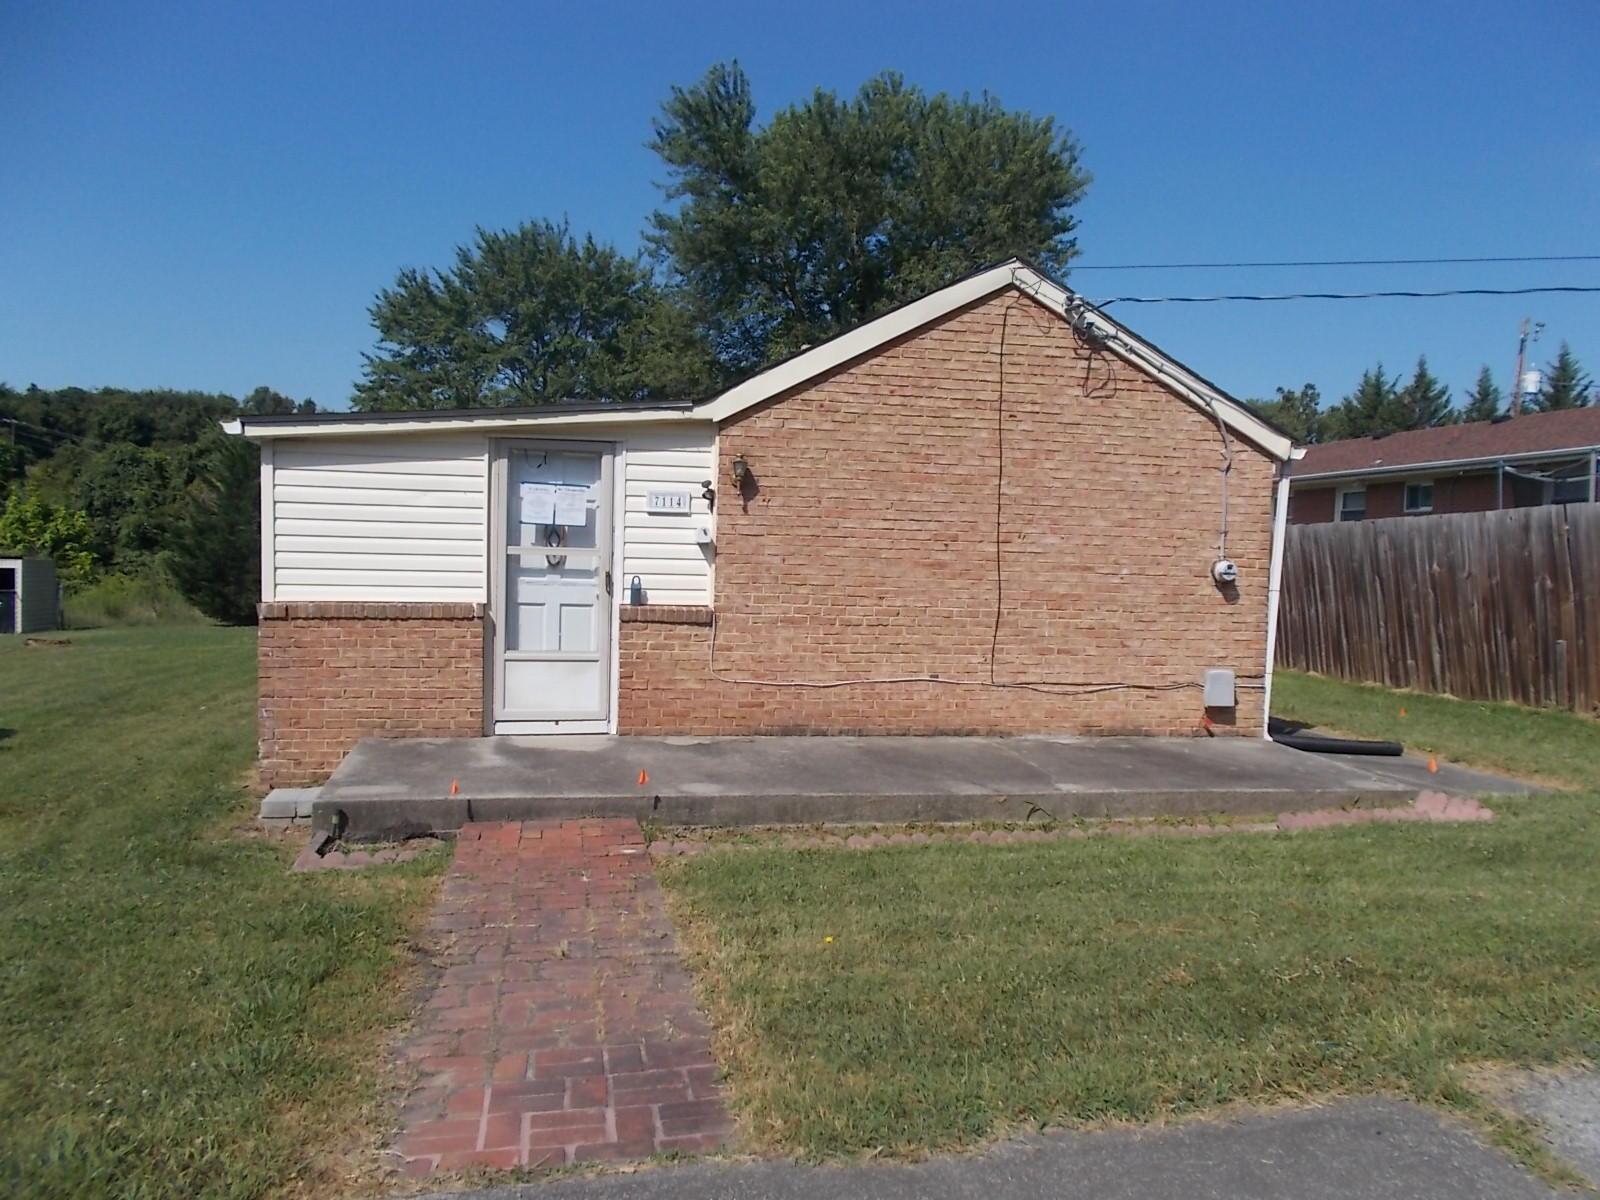 Photo of 7114 South DR Roanoke VA 24019